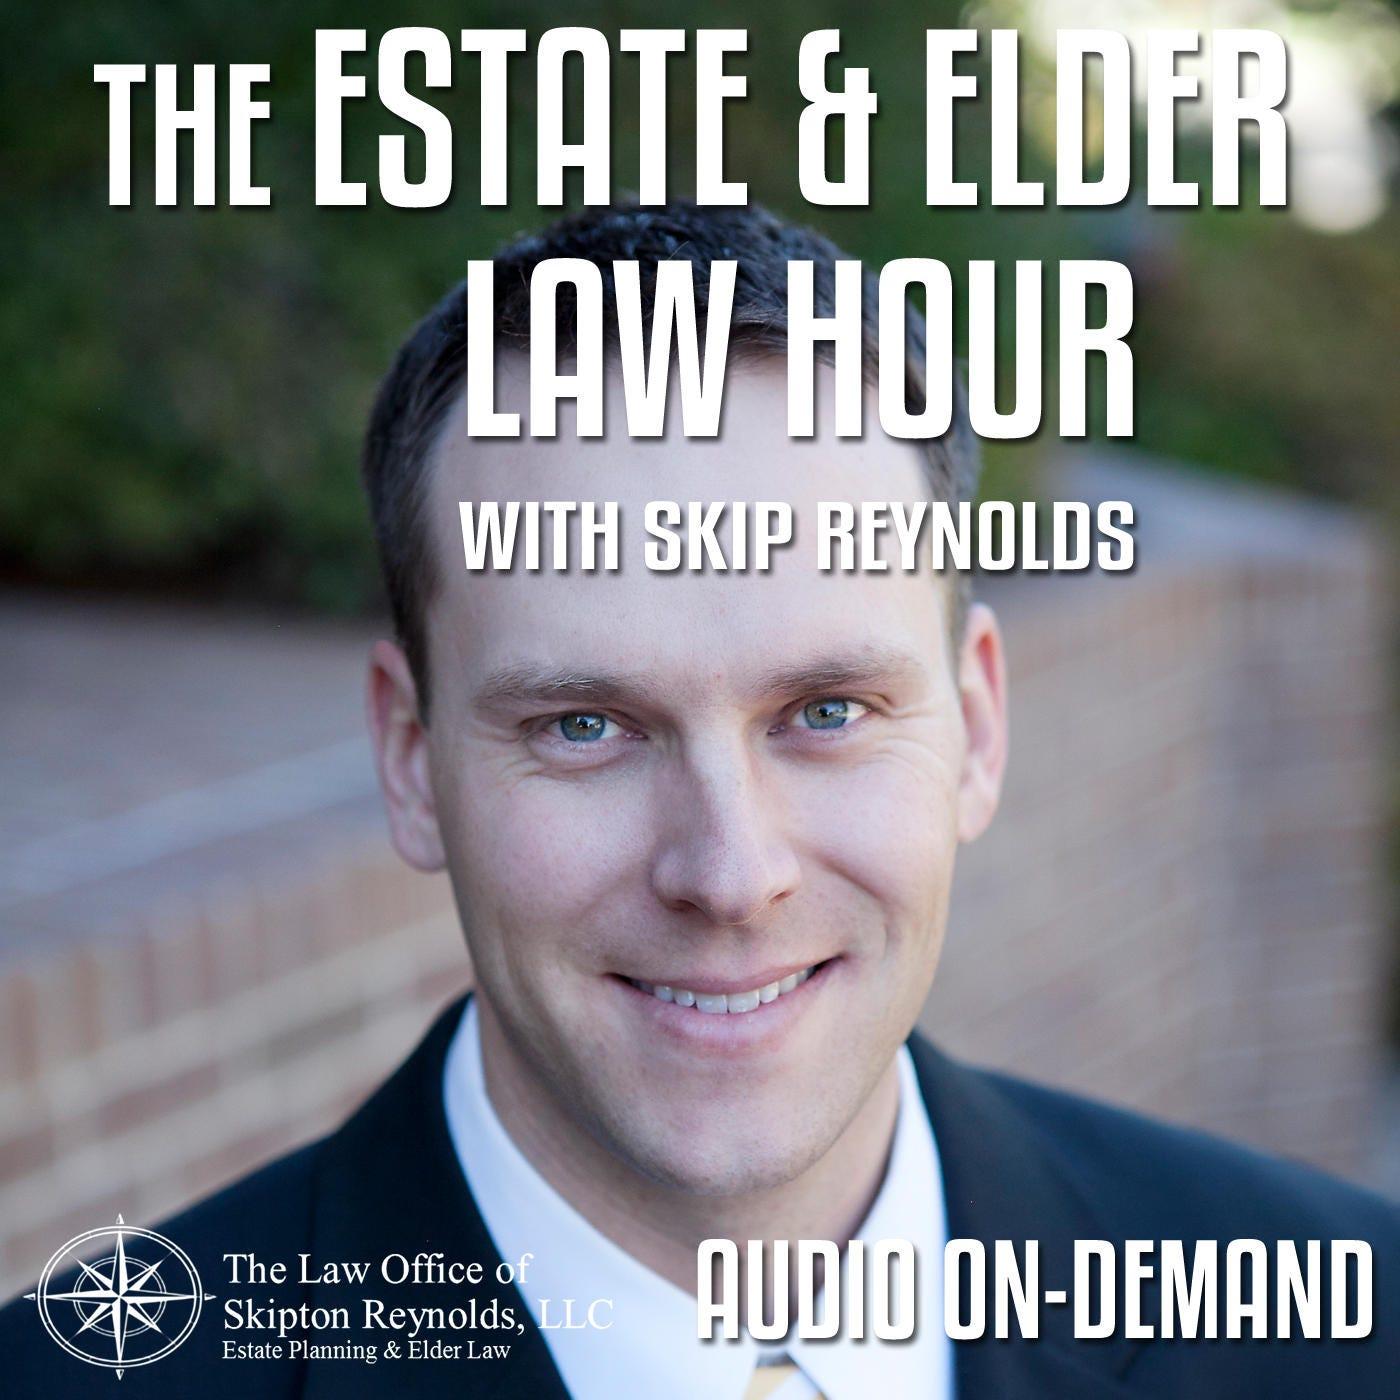 The Estate & Elder Law Hour with Skip Reynolds Audio On-Demand